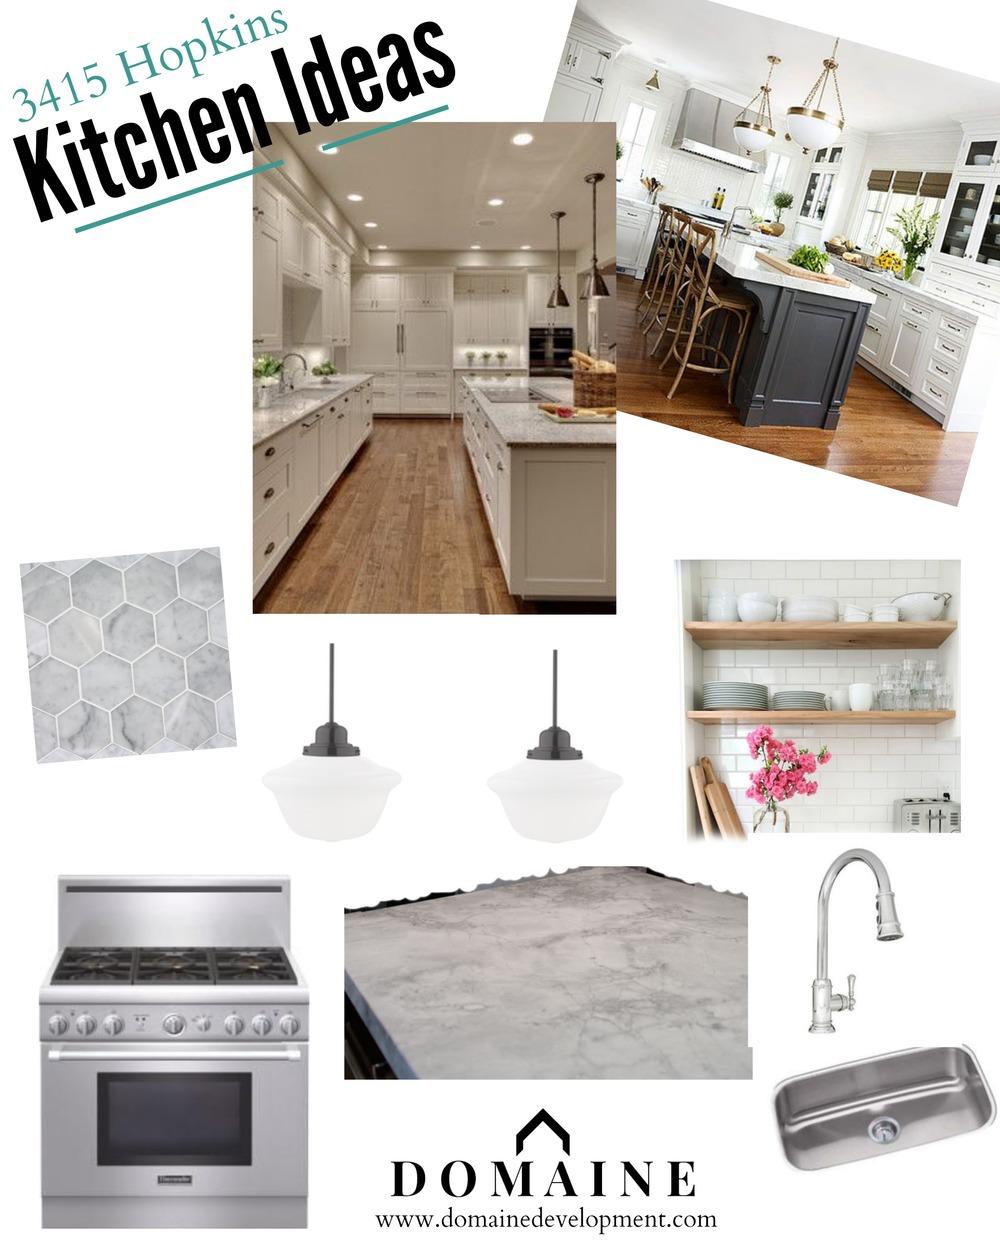 Hopkins Kitchen Sheet.jpg.jpg